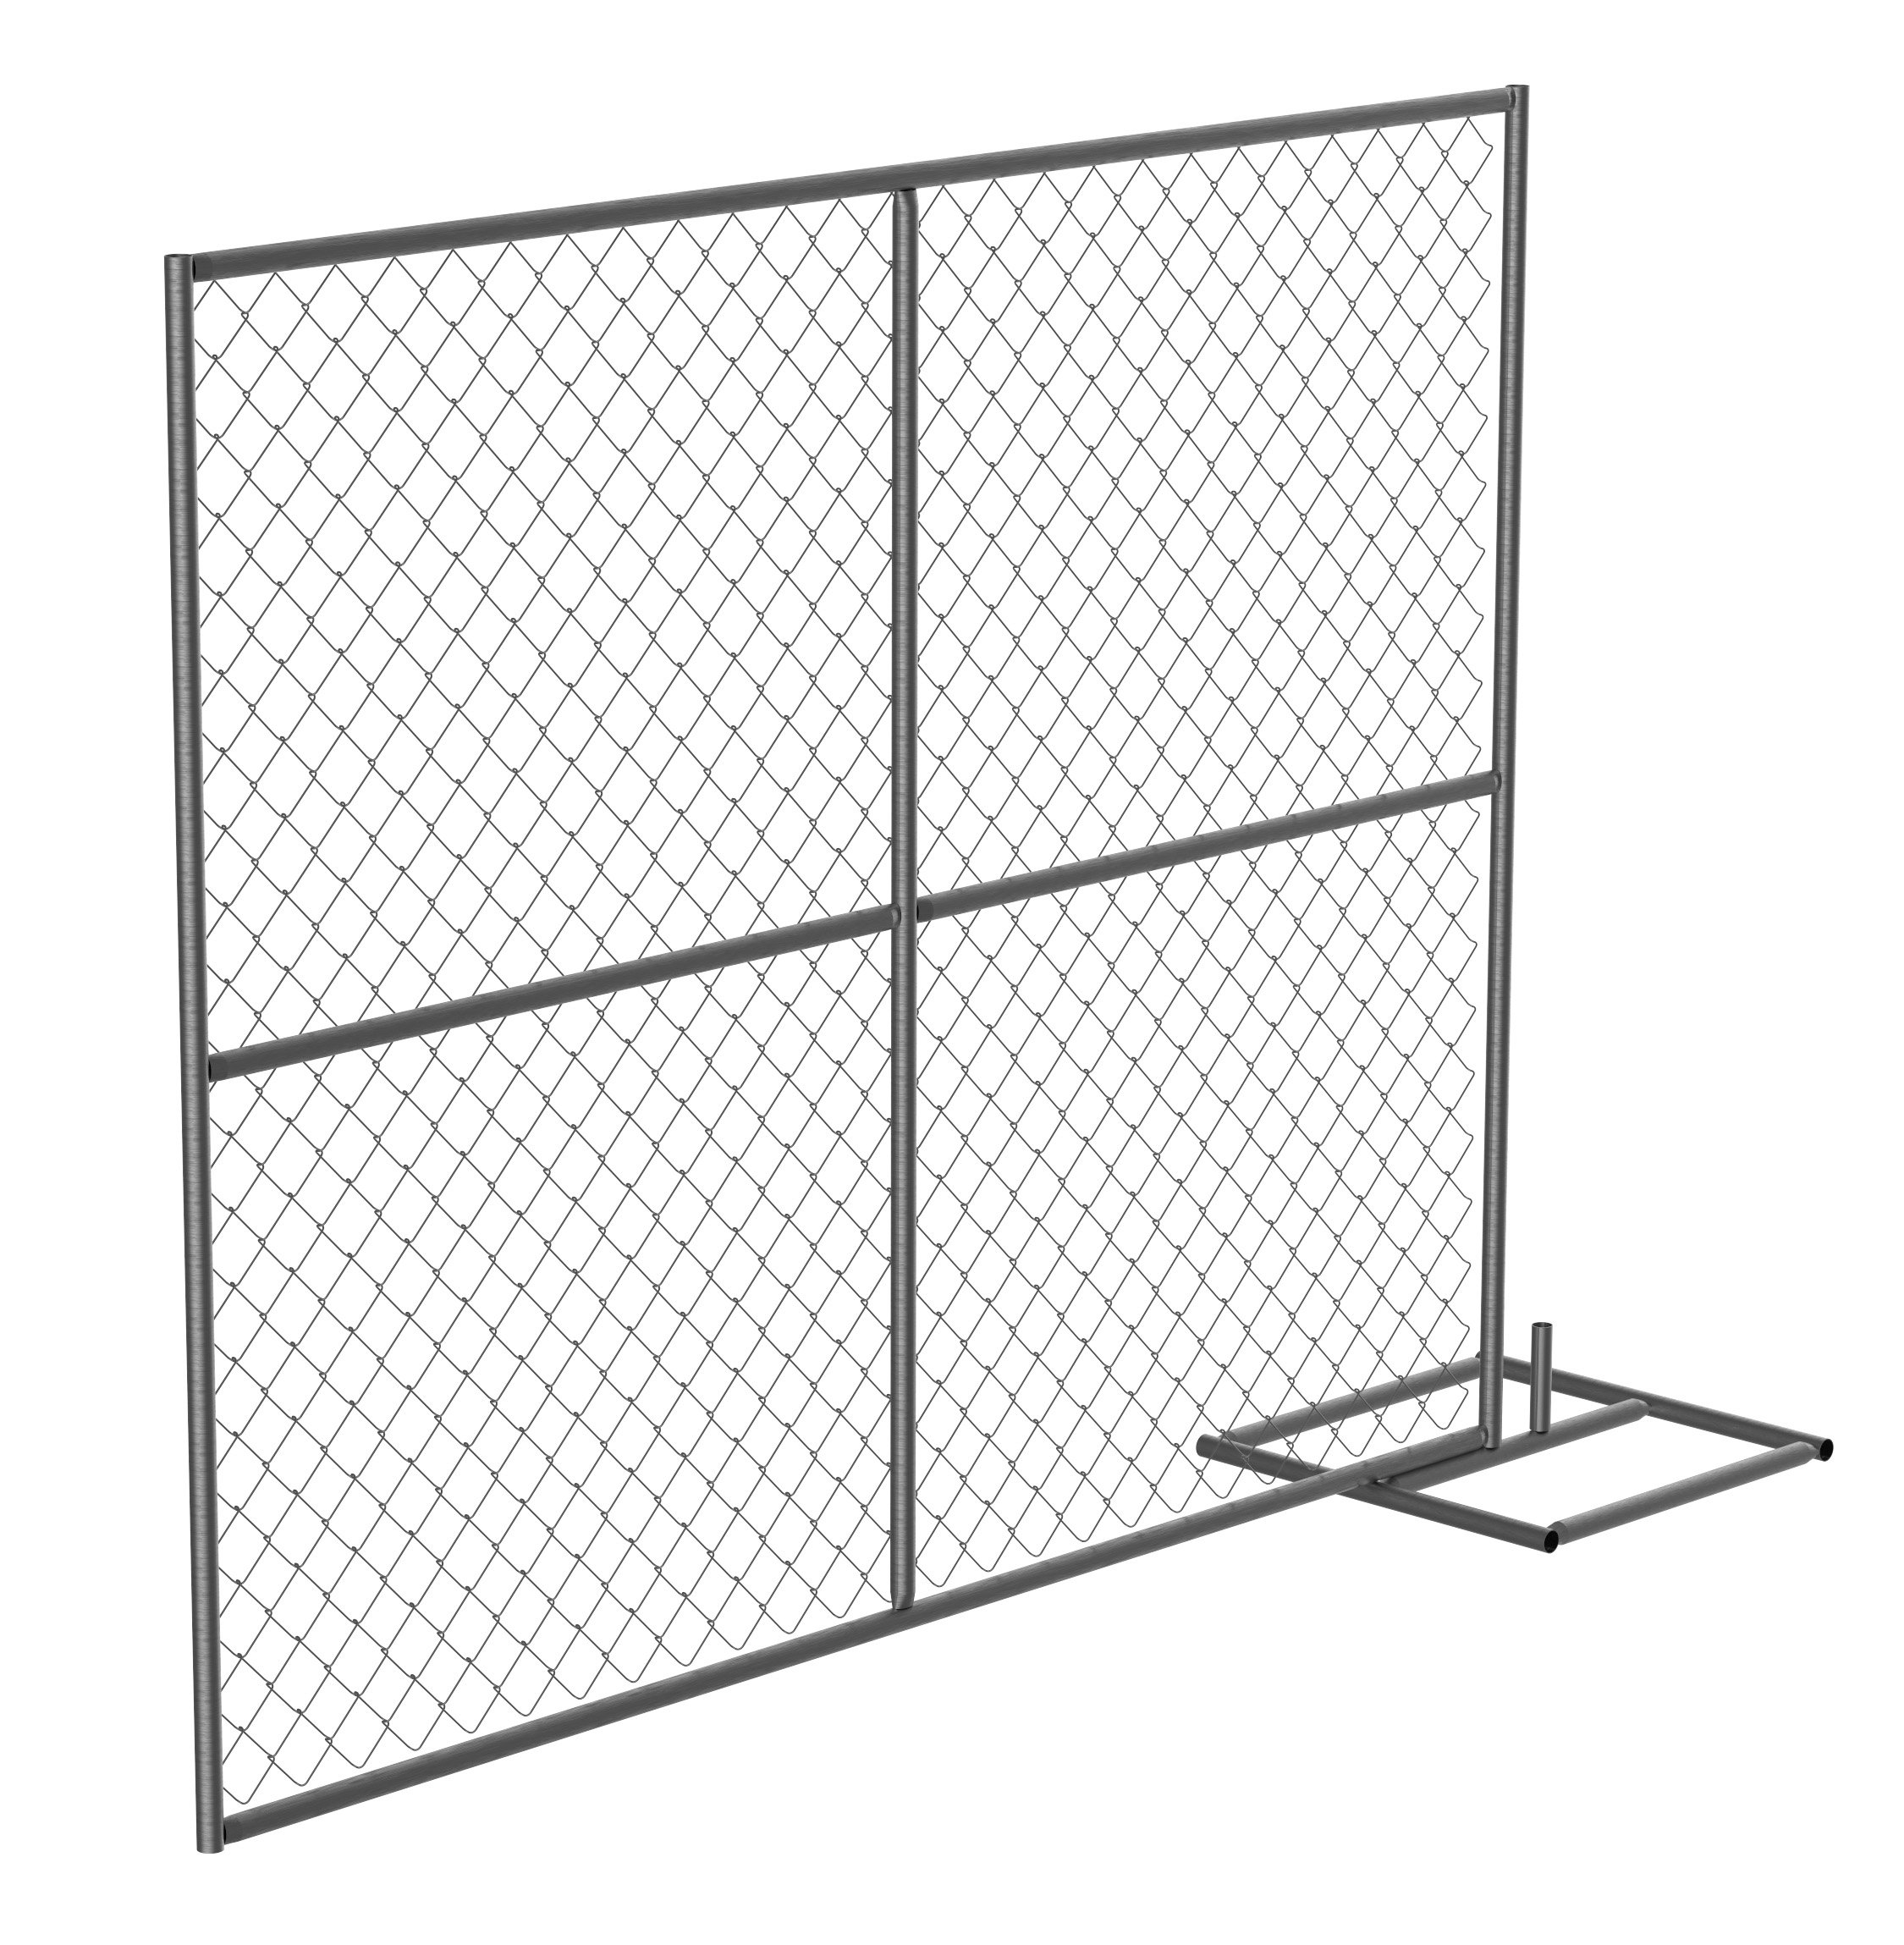 Vestil HRAIL-A-9072 Construction Barrier - Add-On Unit, 1.25'' Length X 102'' Width X 72'' Height, 44 lbs.